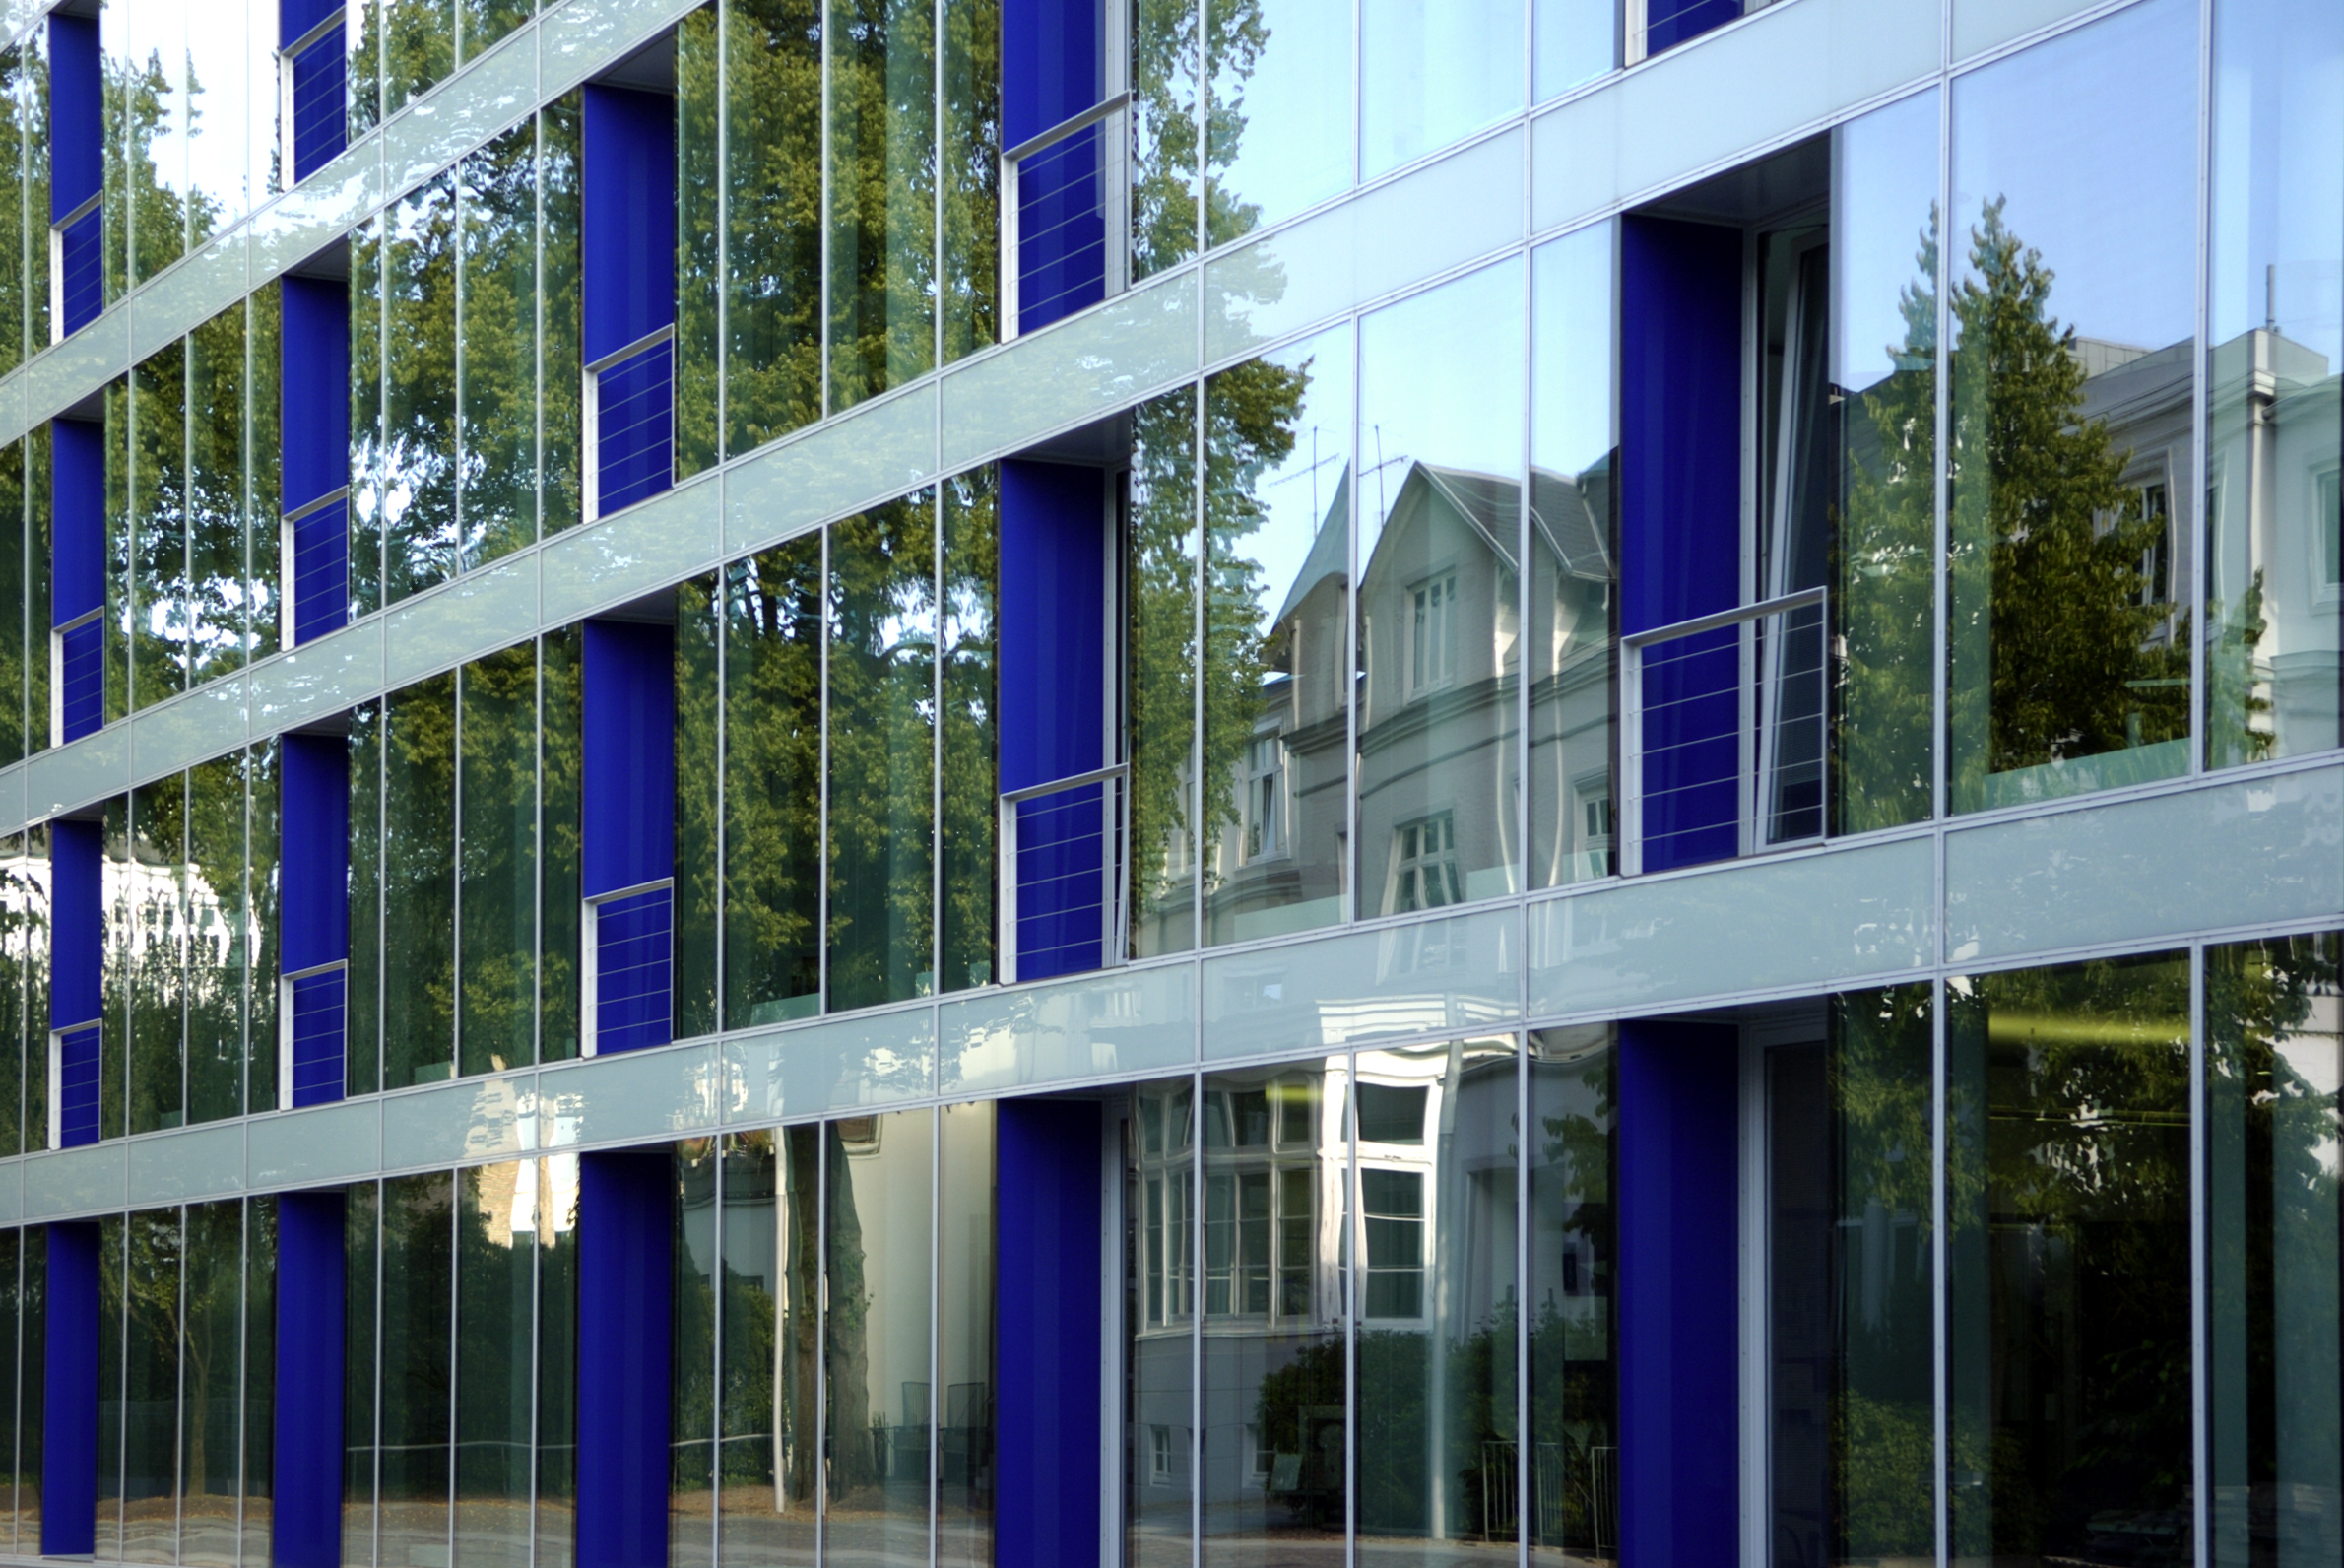 NDR Rothenbaumchausse Haus 12